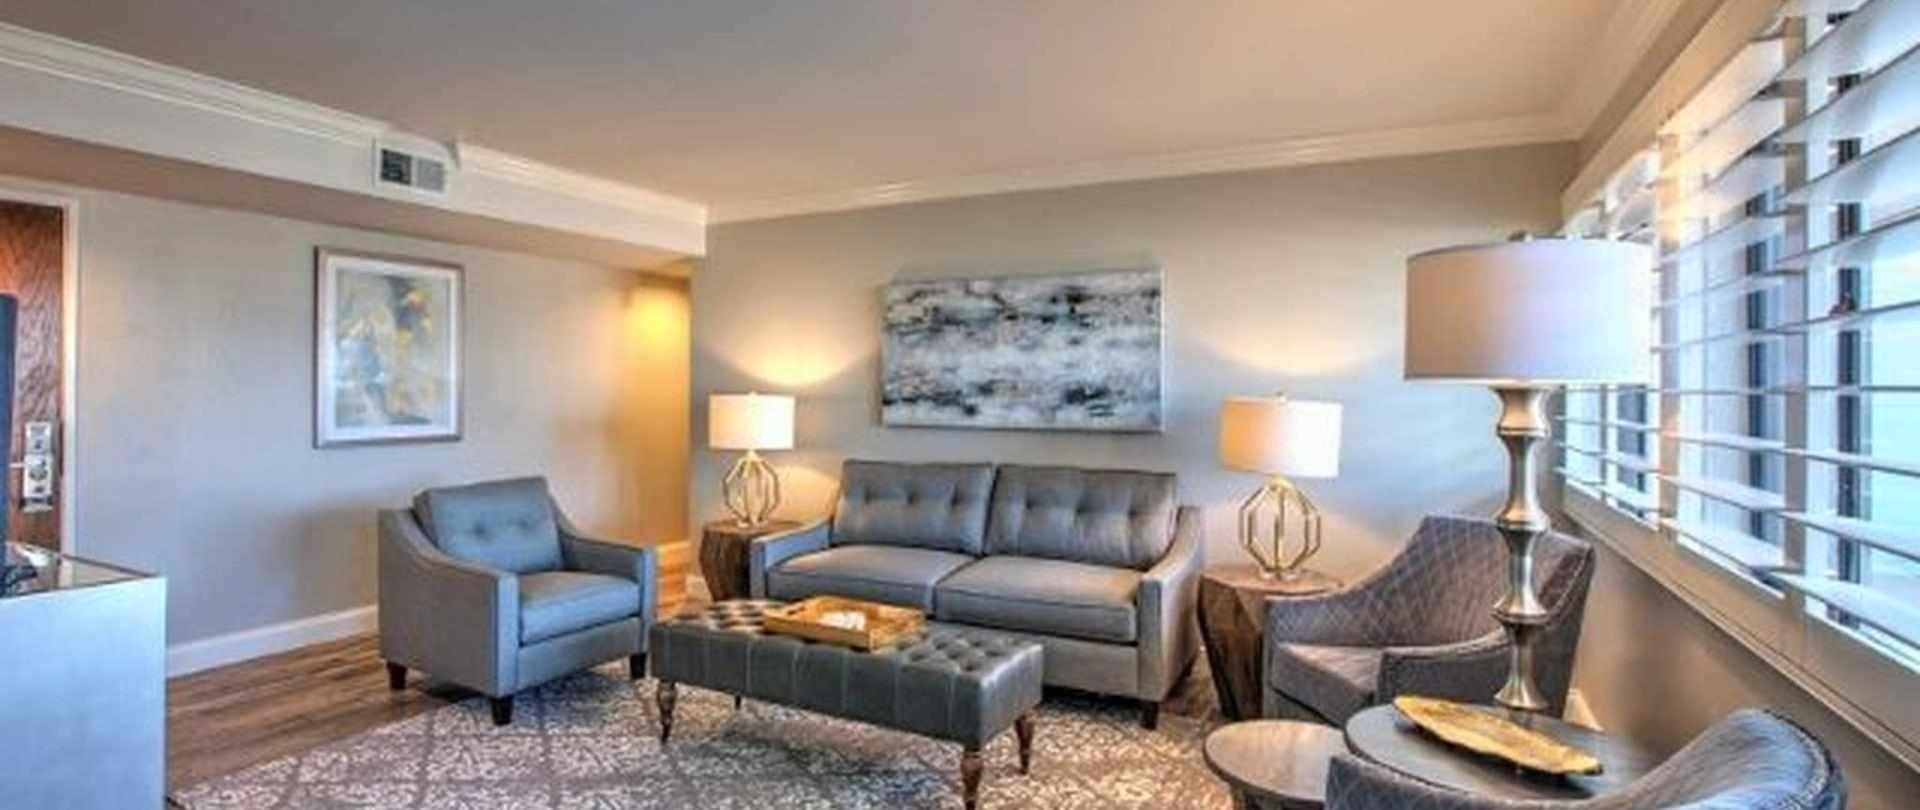 livingroom4-versie-2-3-jpg-resize.jpg.1920x810_default.jpeg.1920x0.jpeg